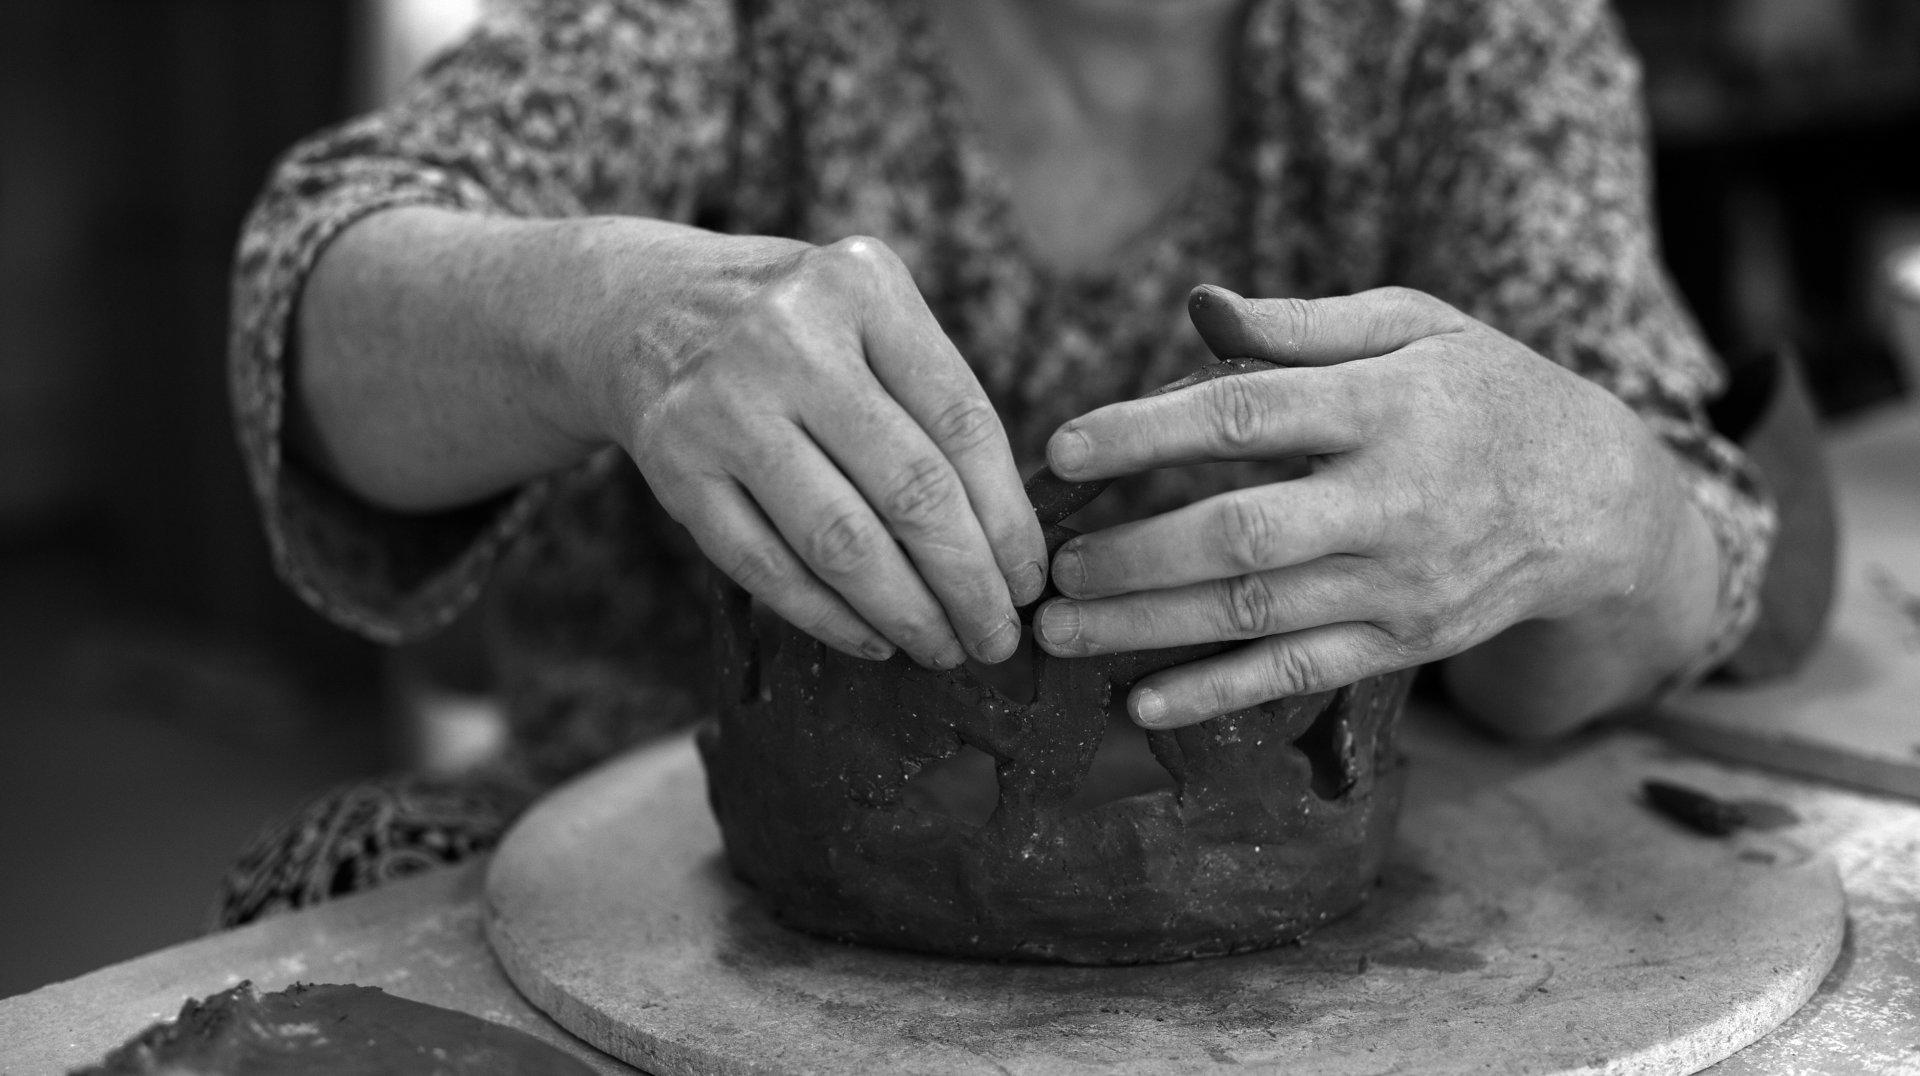 La Chaux-de-Fonds marchera au rythme de Bon pied bon art